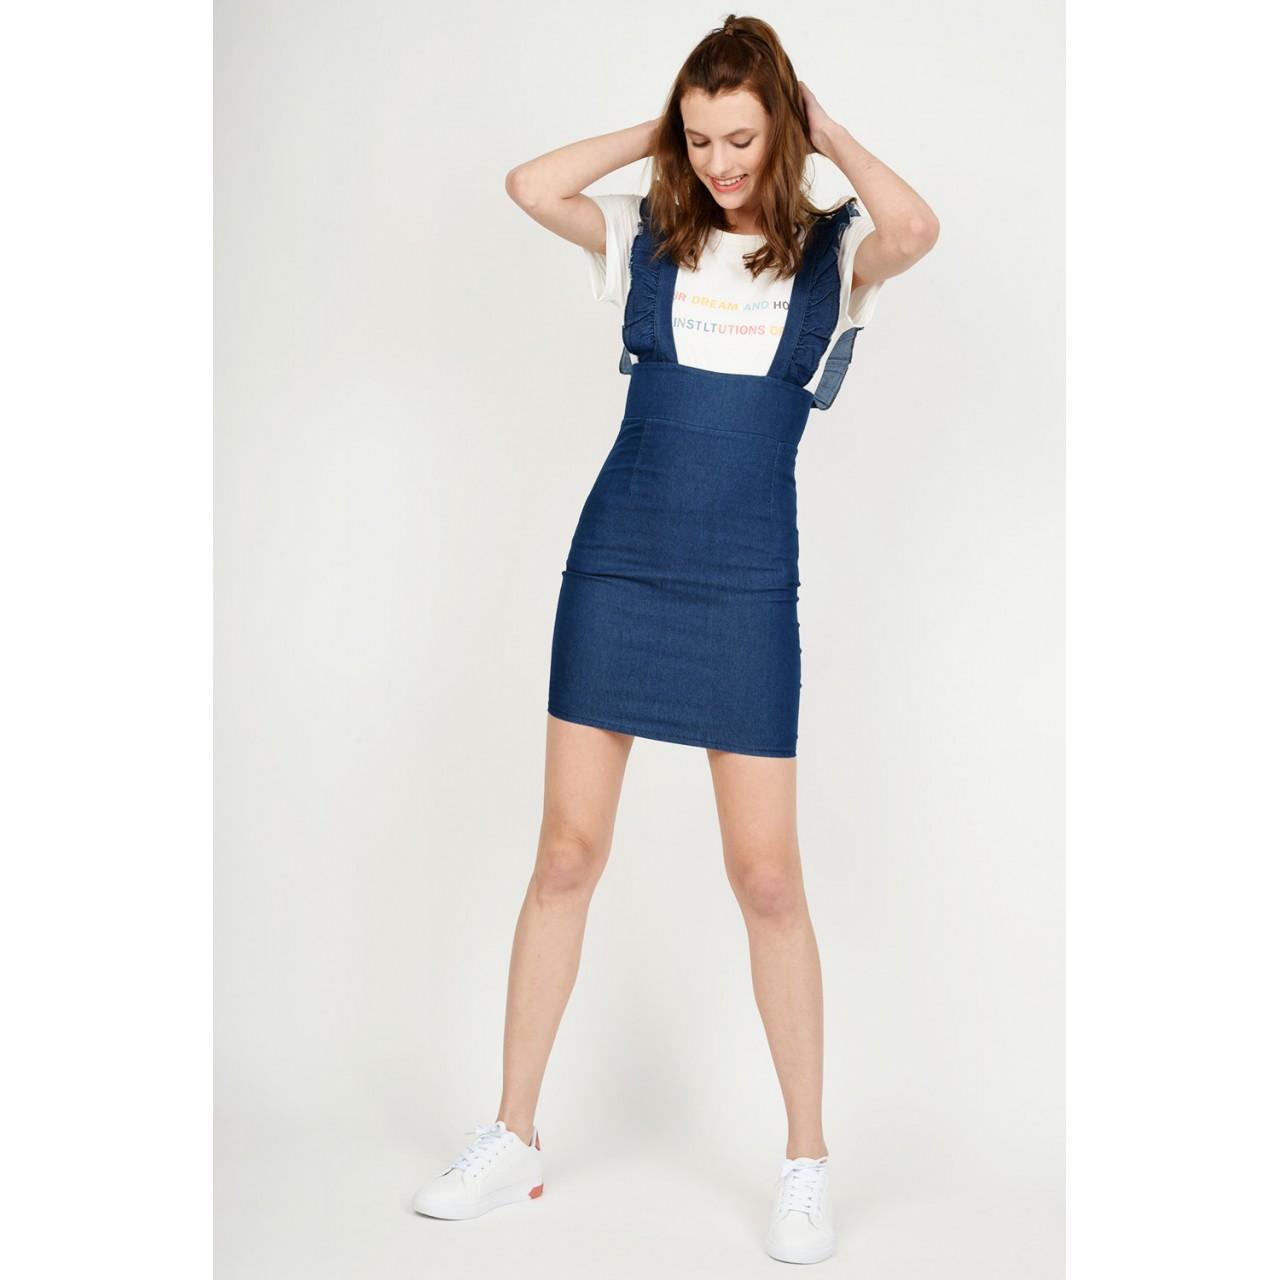 3f24c2cc6020 Σαλοπέτα φούστα jean με τιράντες βολάν